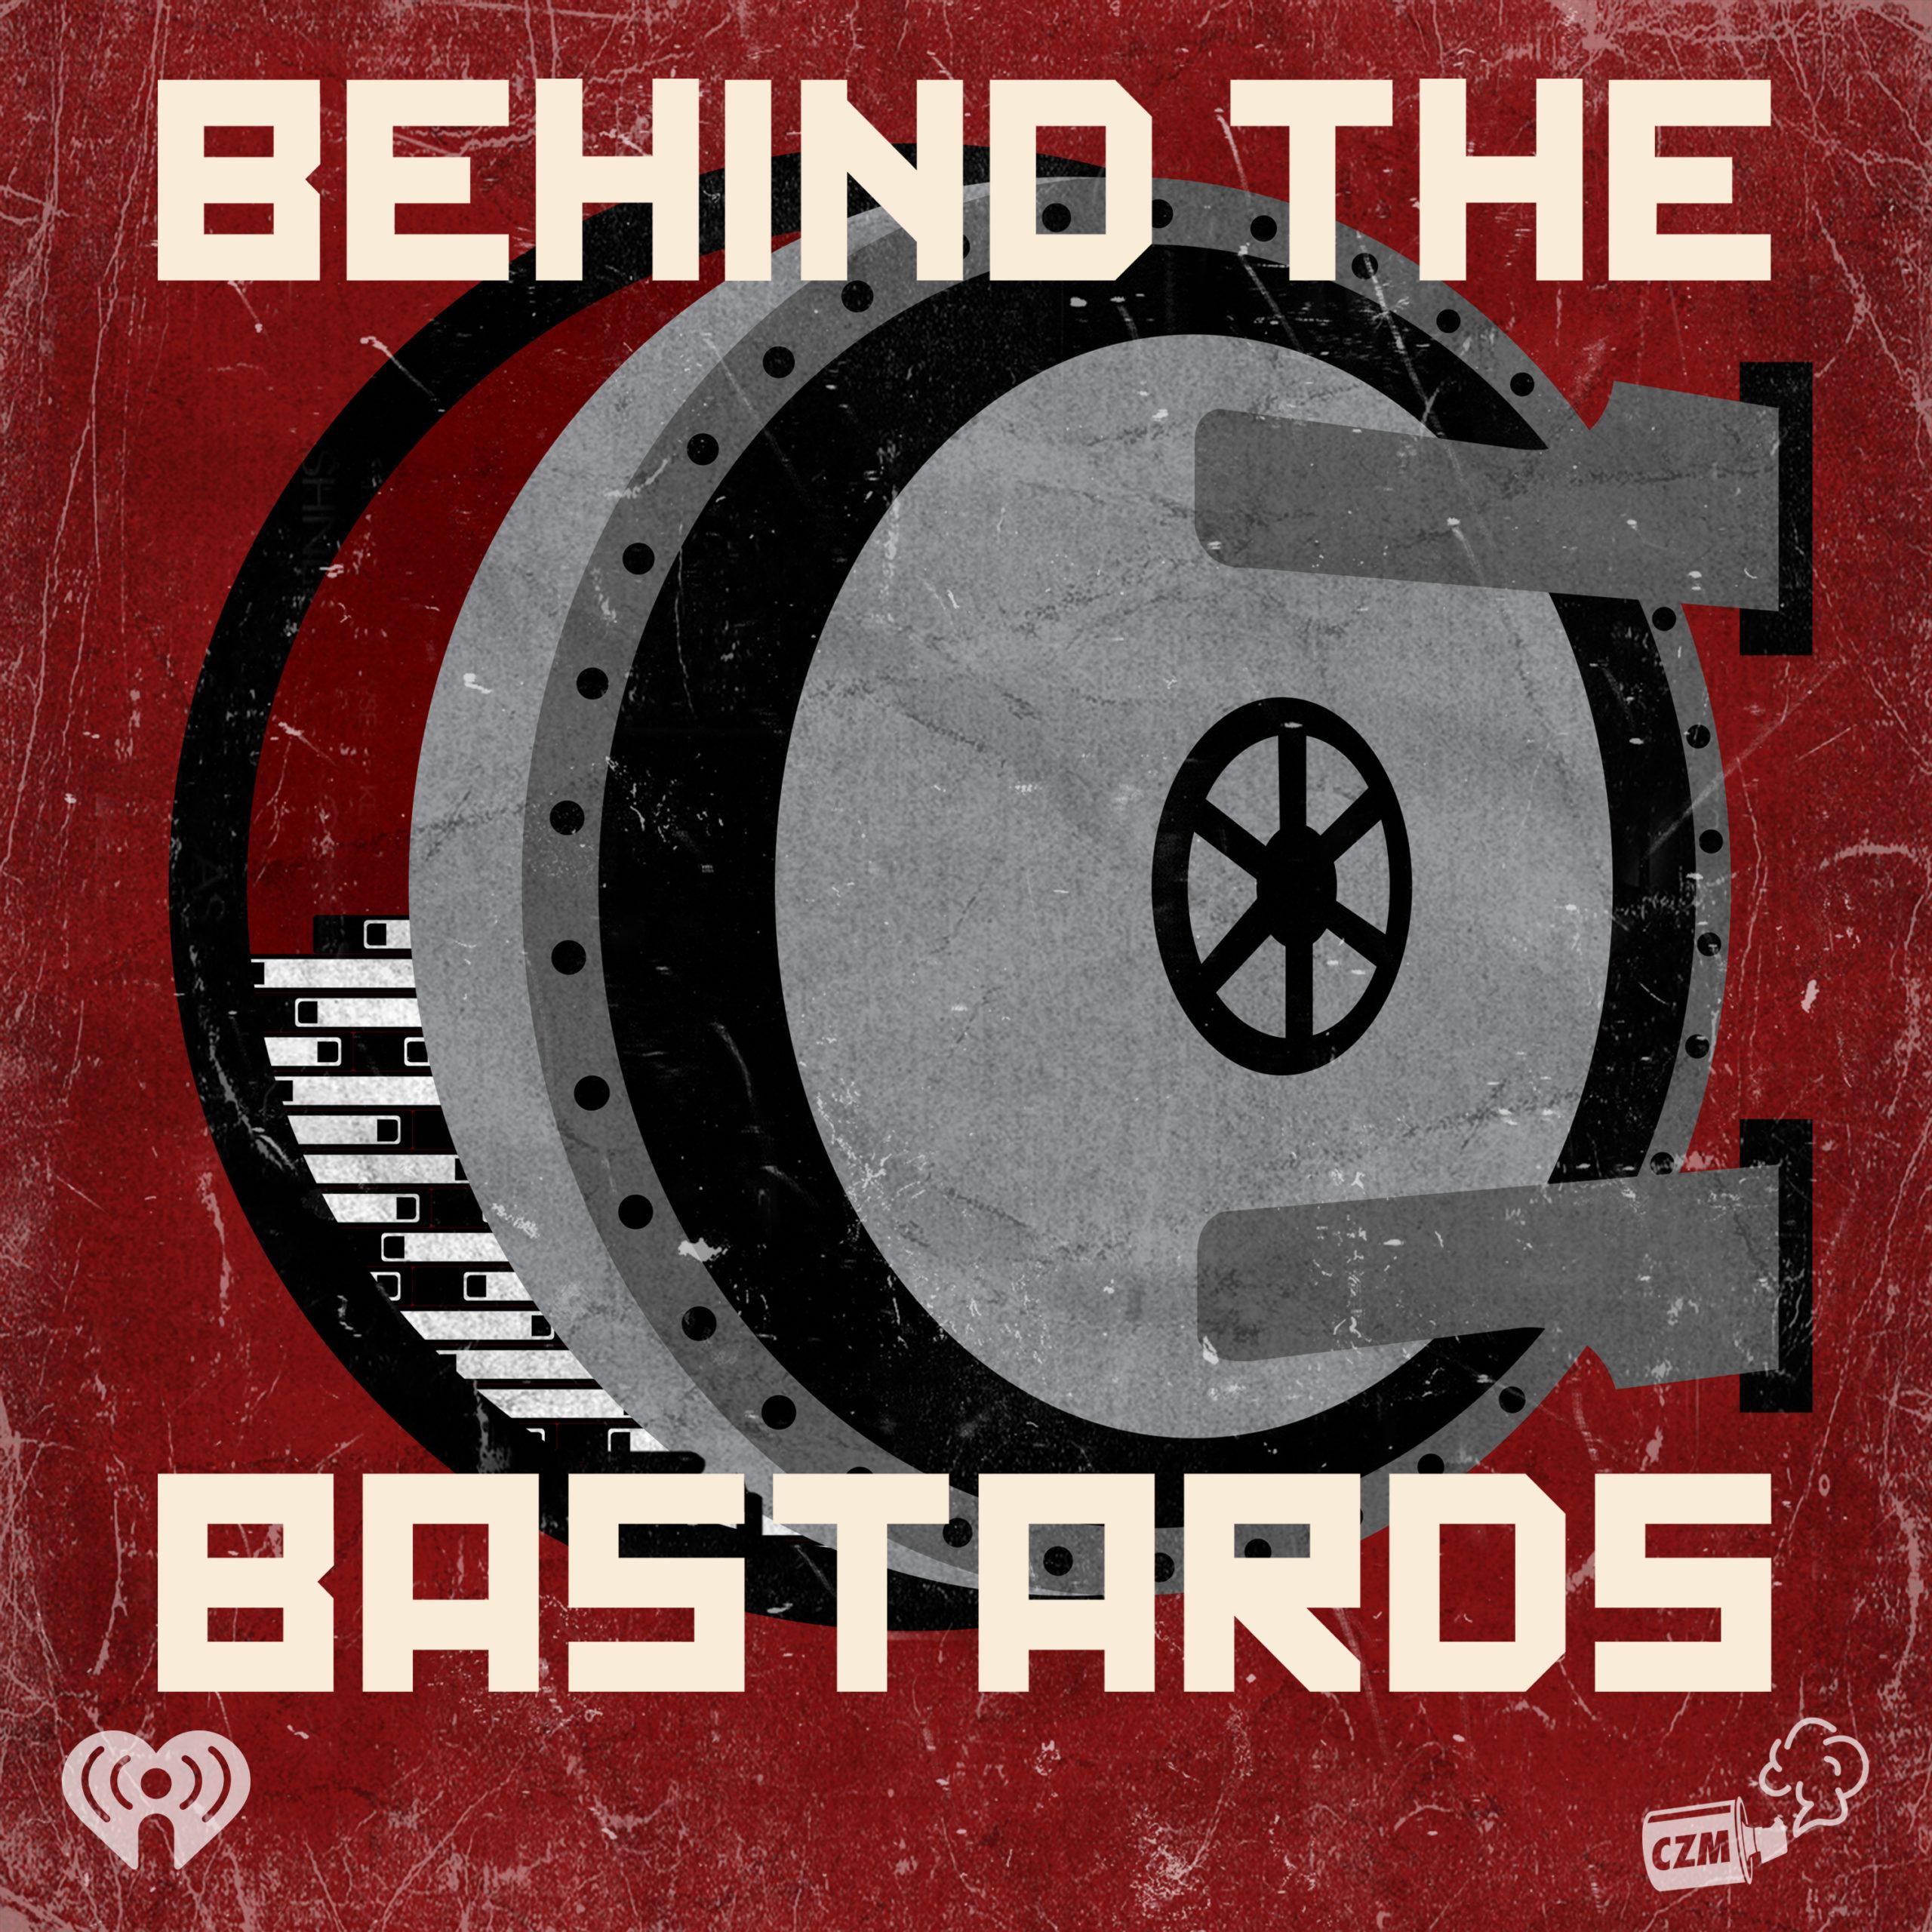 Behind the Bastards logo